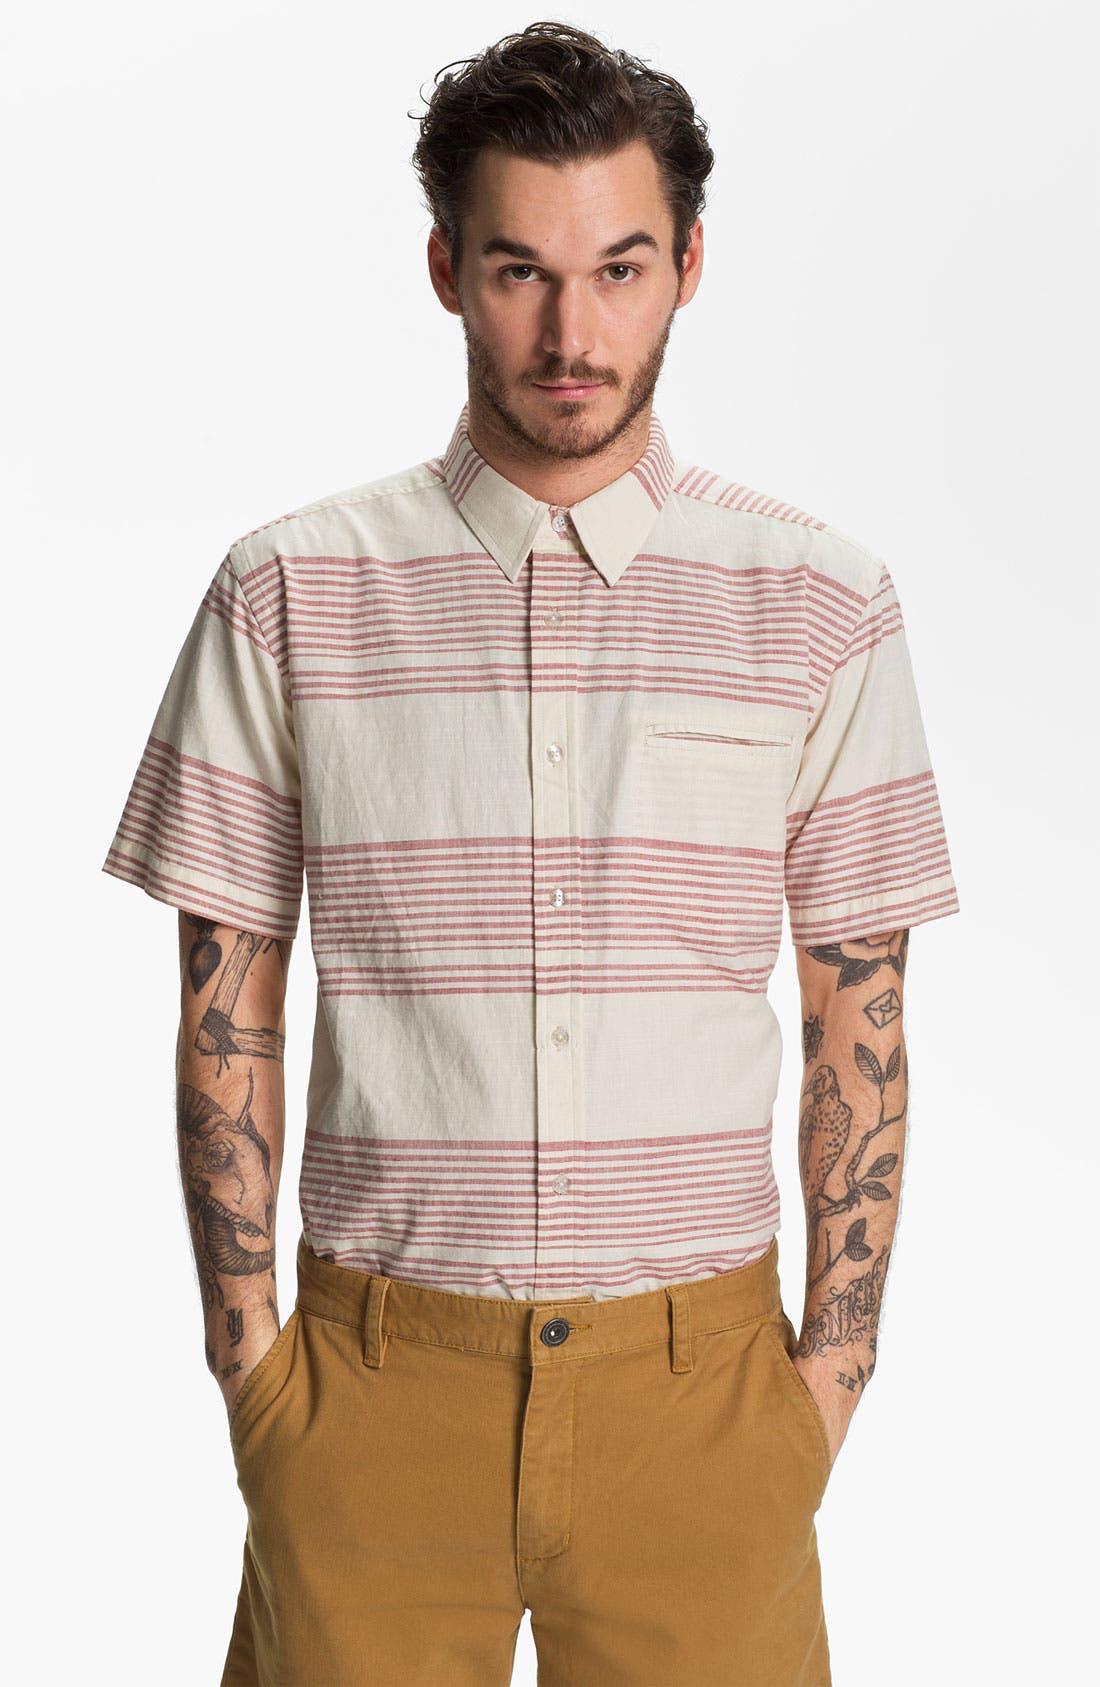 Alternate Image 1 Selected - Ezekiel 'Jed' Stripe Short Sleeve Woven Shirt